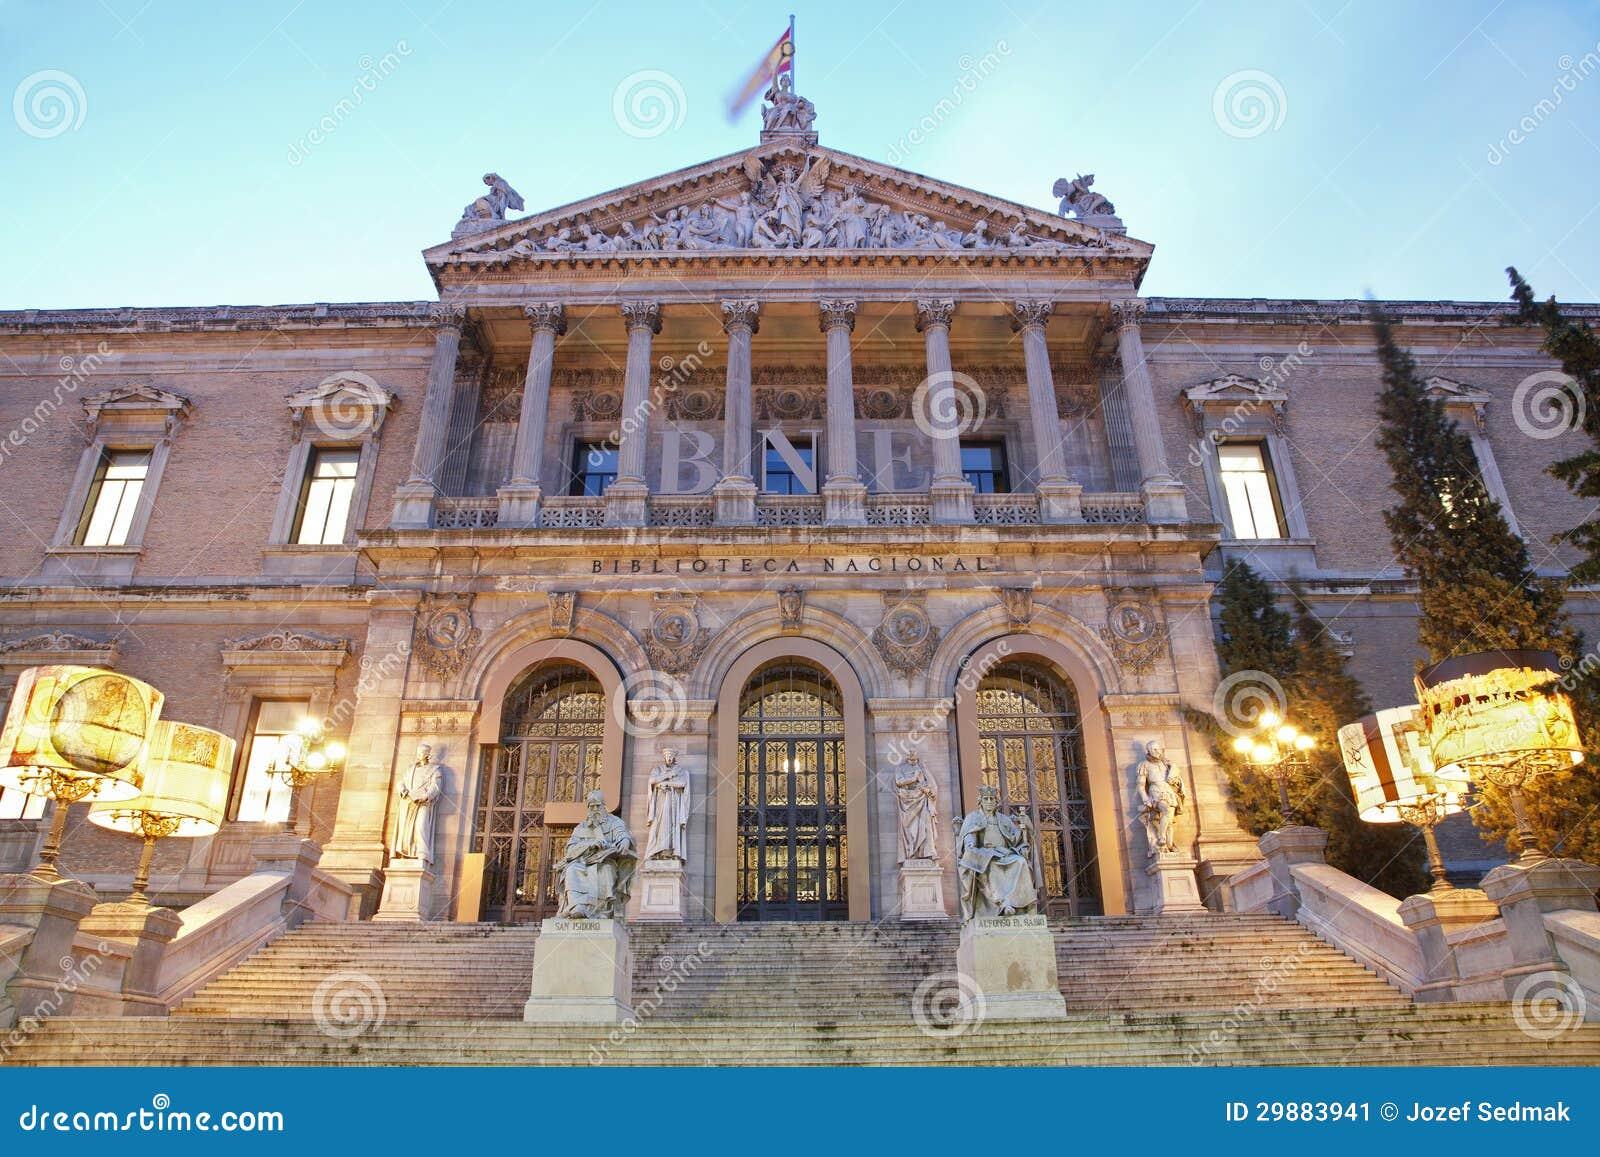 Madrid - Portaal van Museo Arqueológico Nacional - Nationaal Archeologisch Museum van Spanje